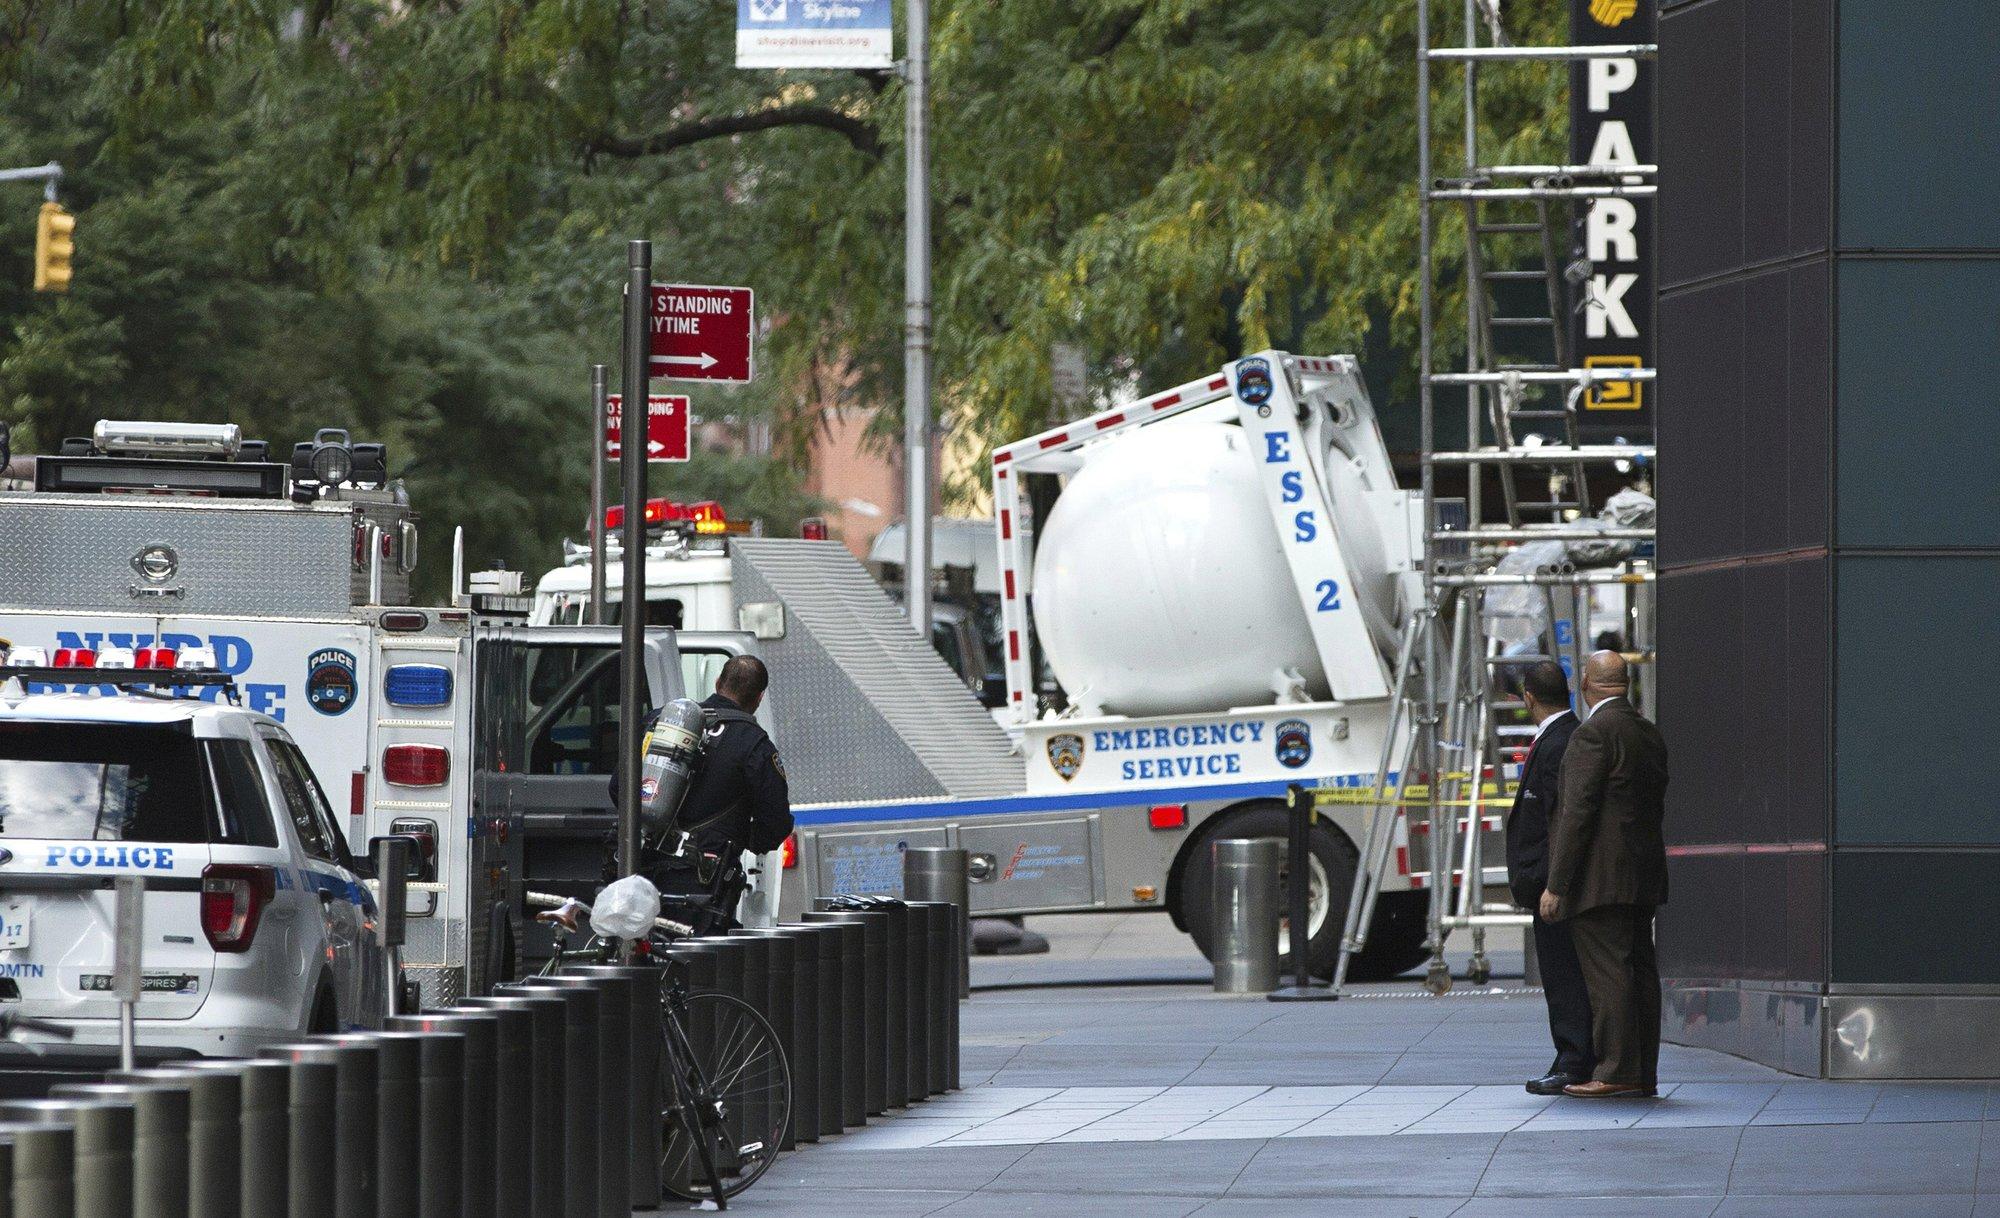 NYC Bomb_1540463151676.jpeg.jpg